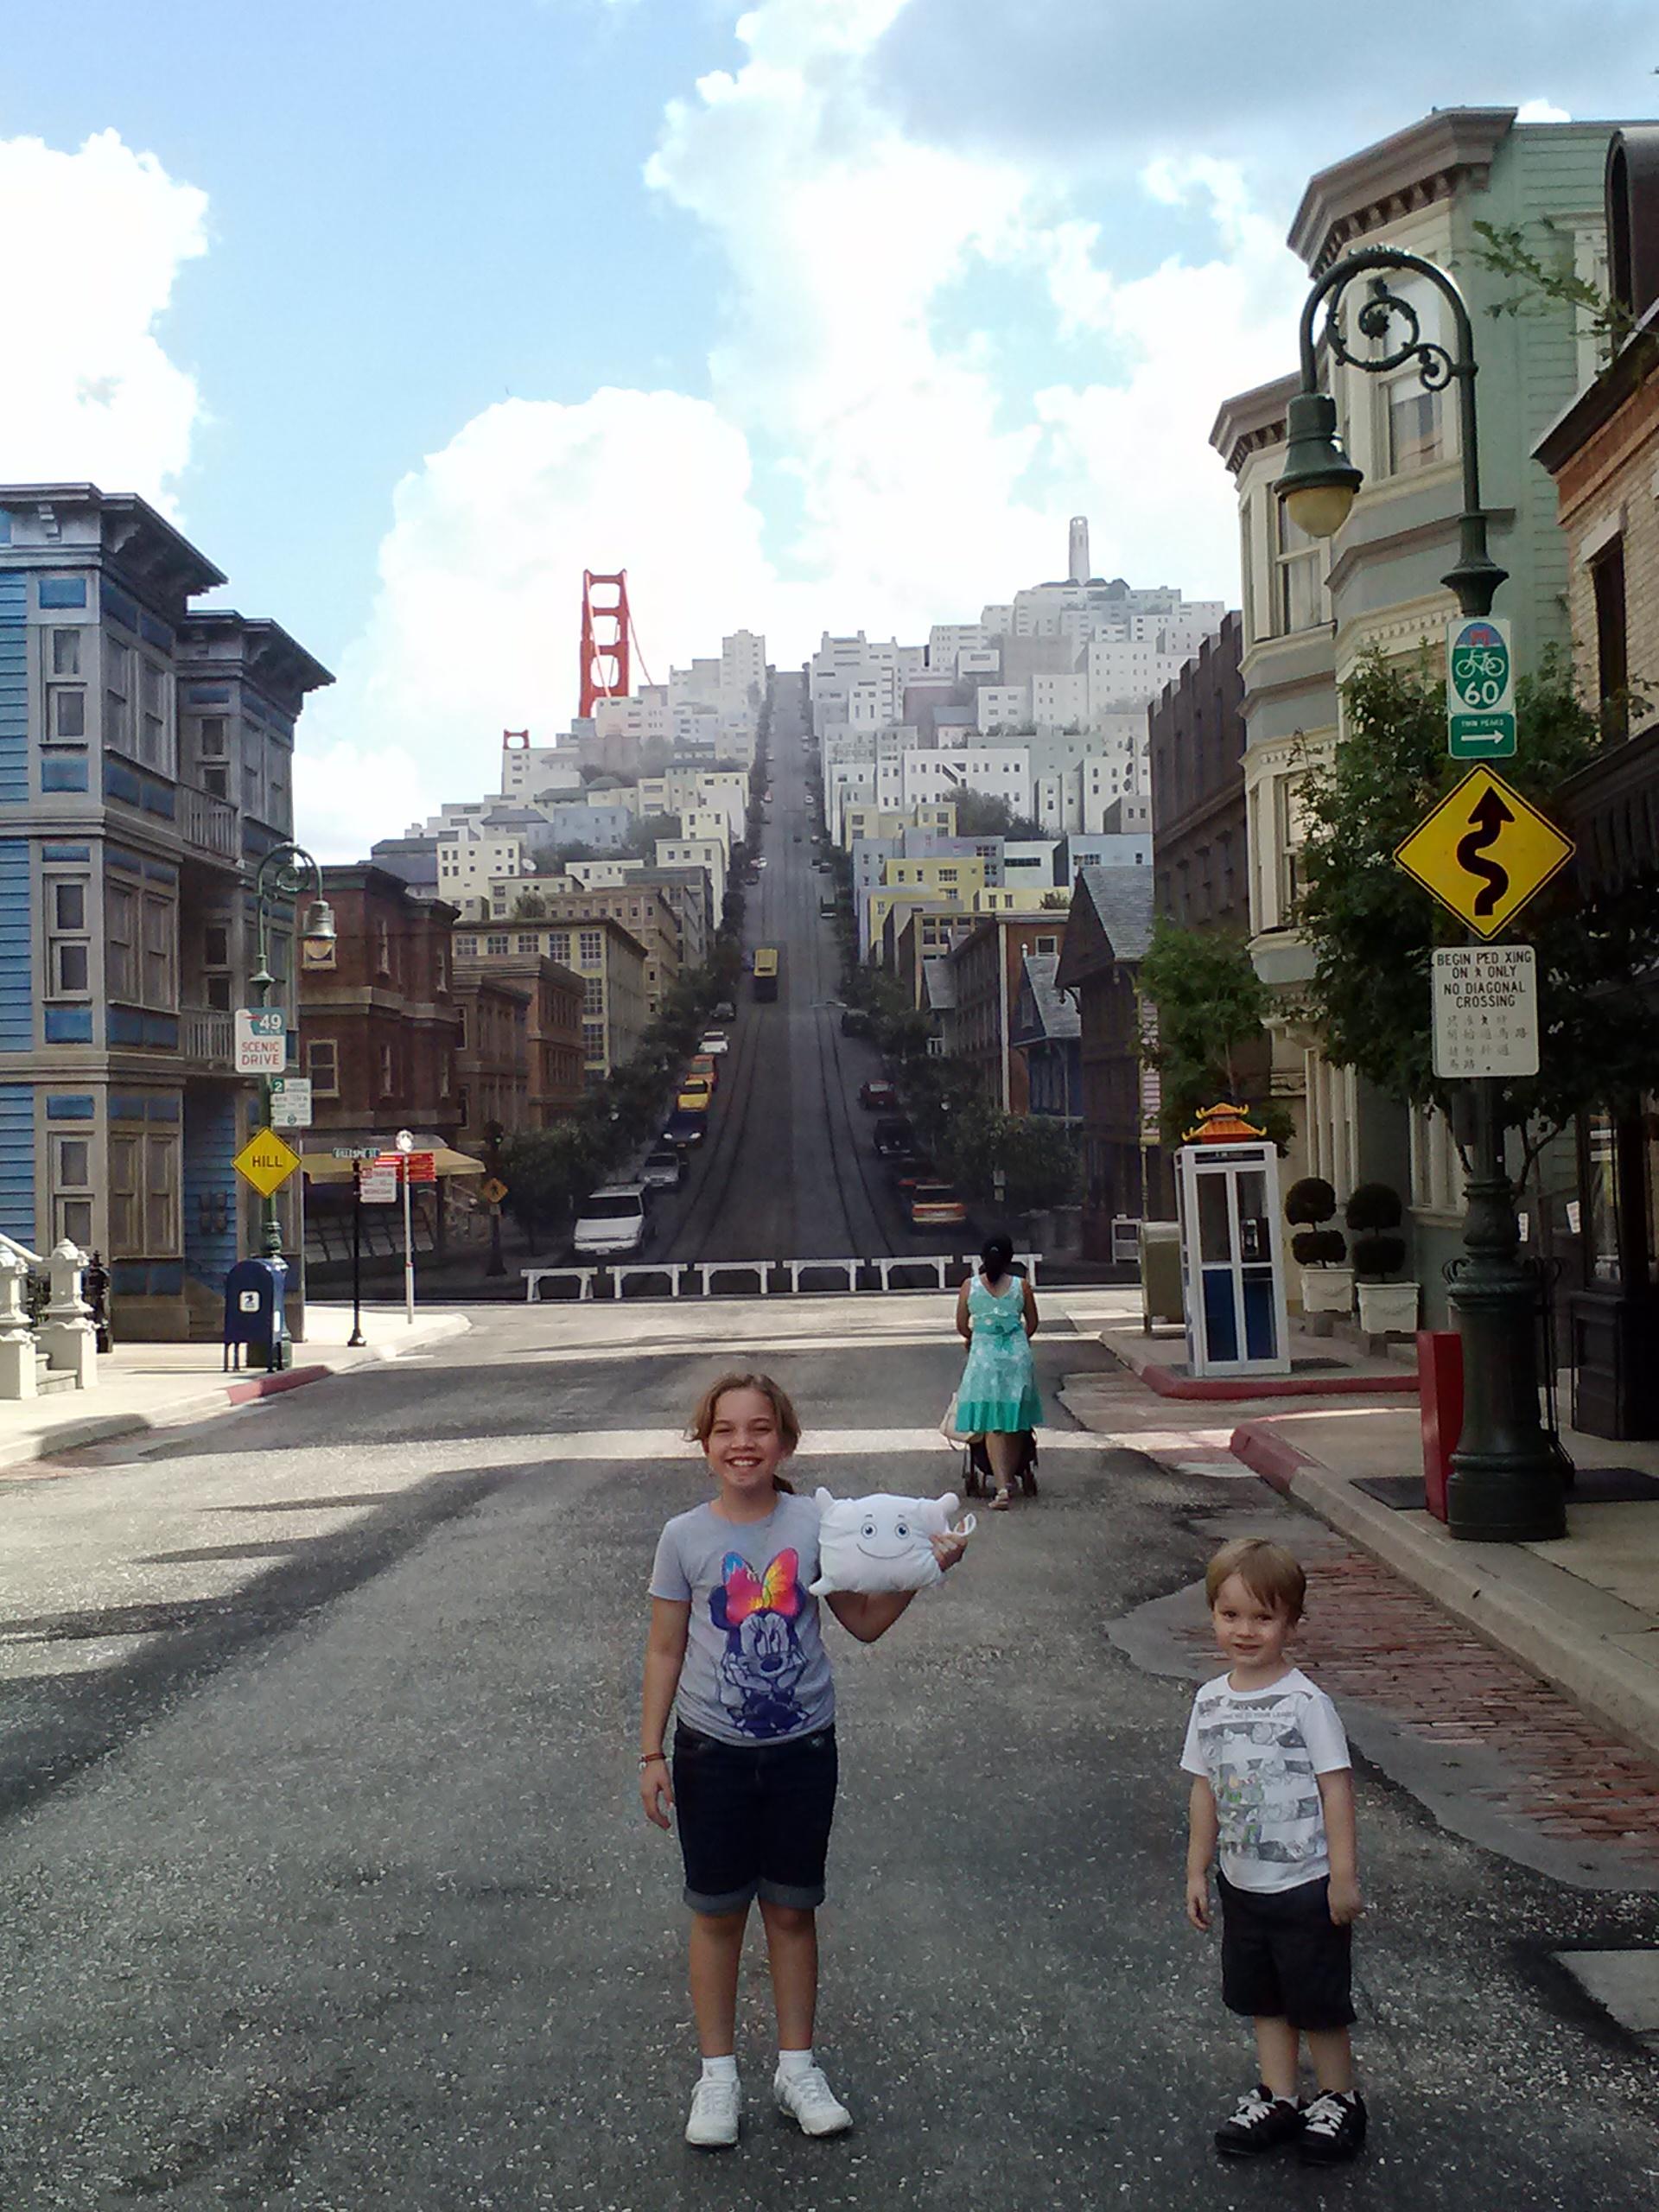 Is McStuffy in San Francisco or Hollywood Studios at Disney World?